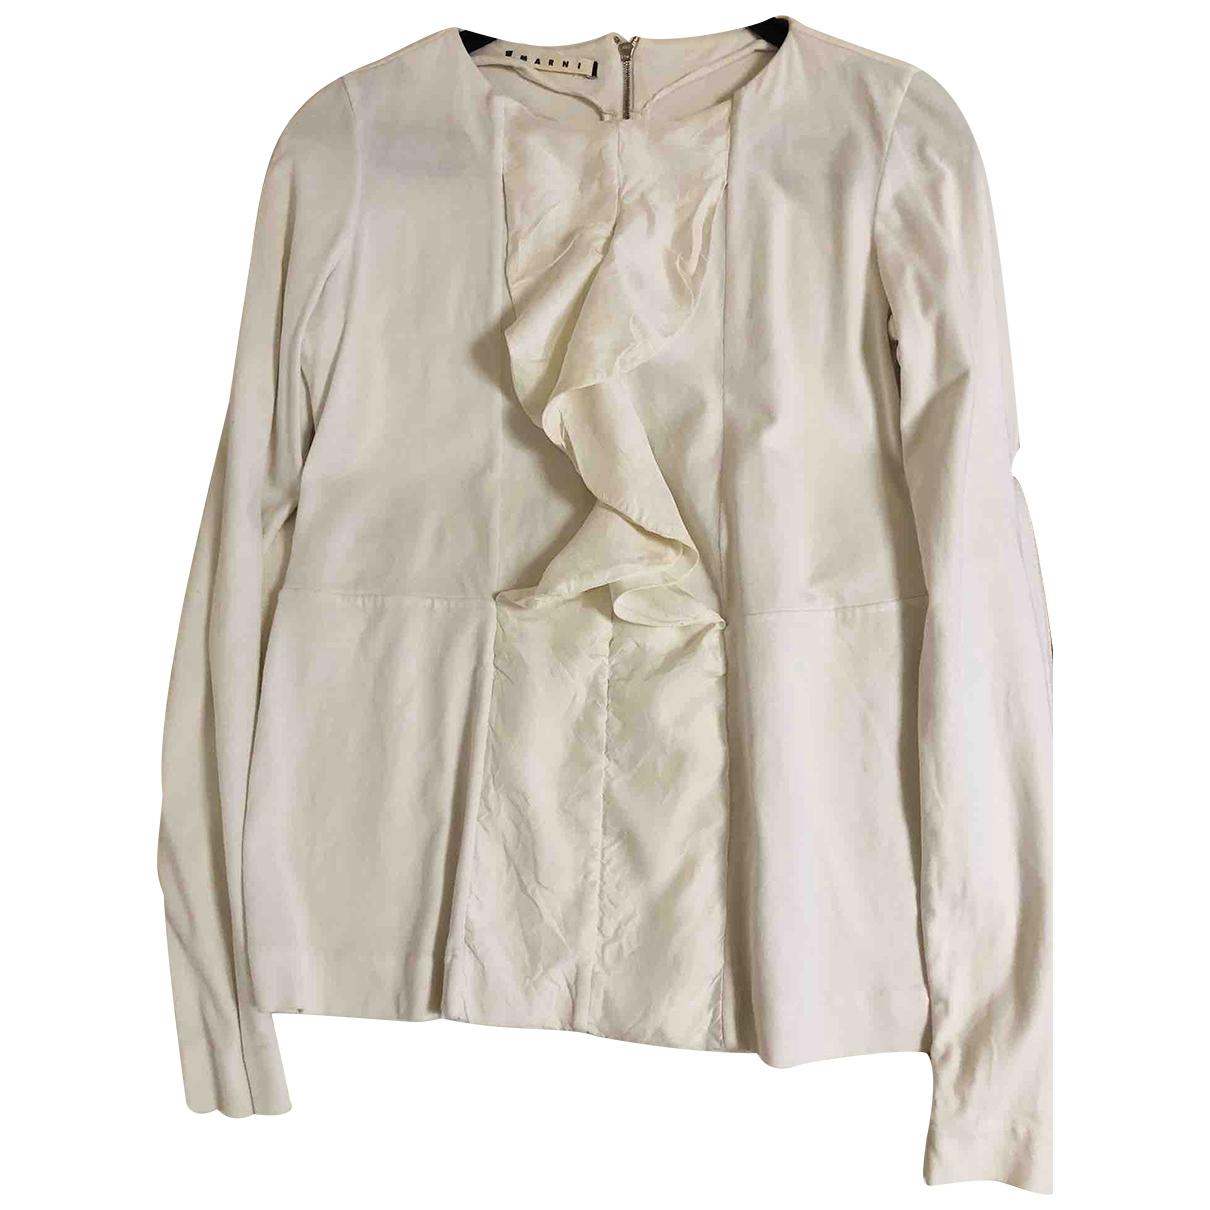 Marni \N White Cotton  top for Women 38 IT